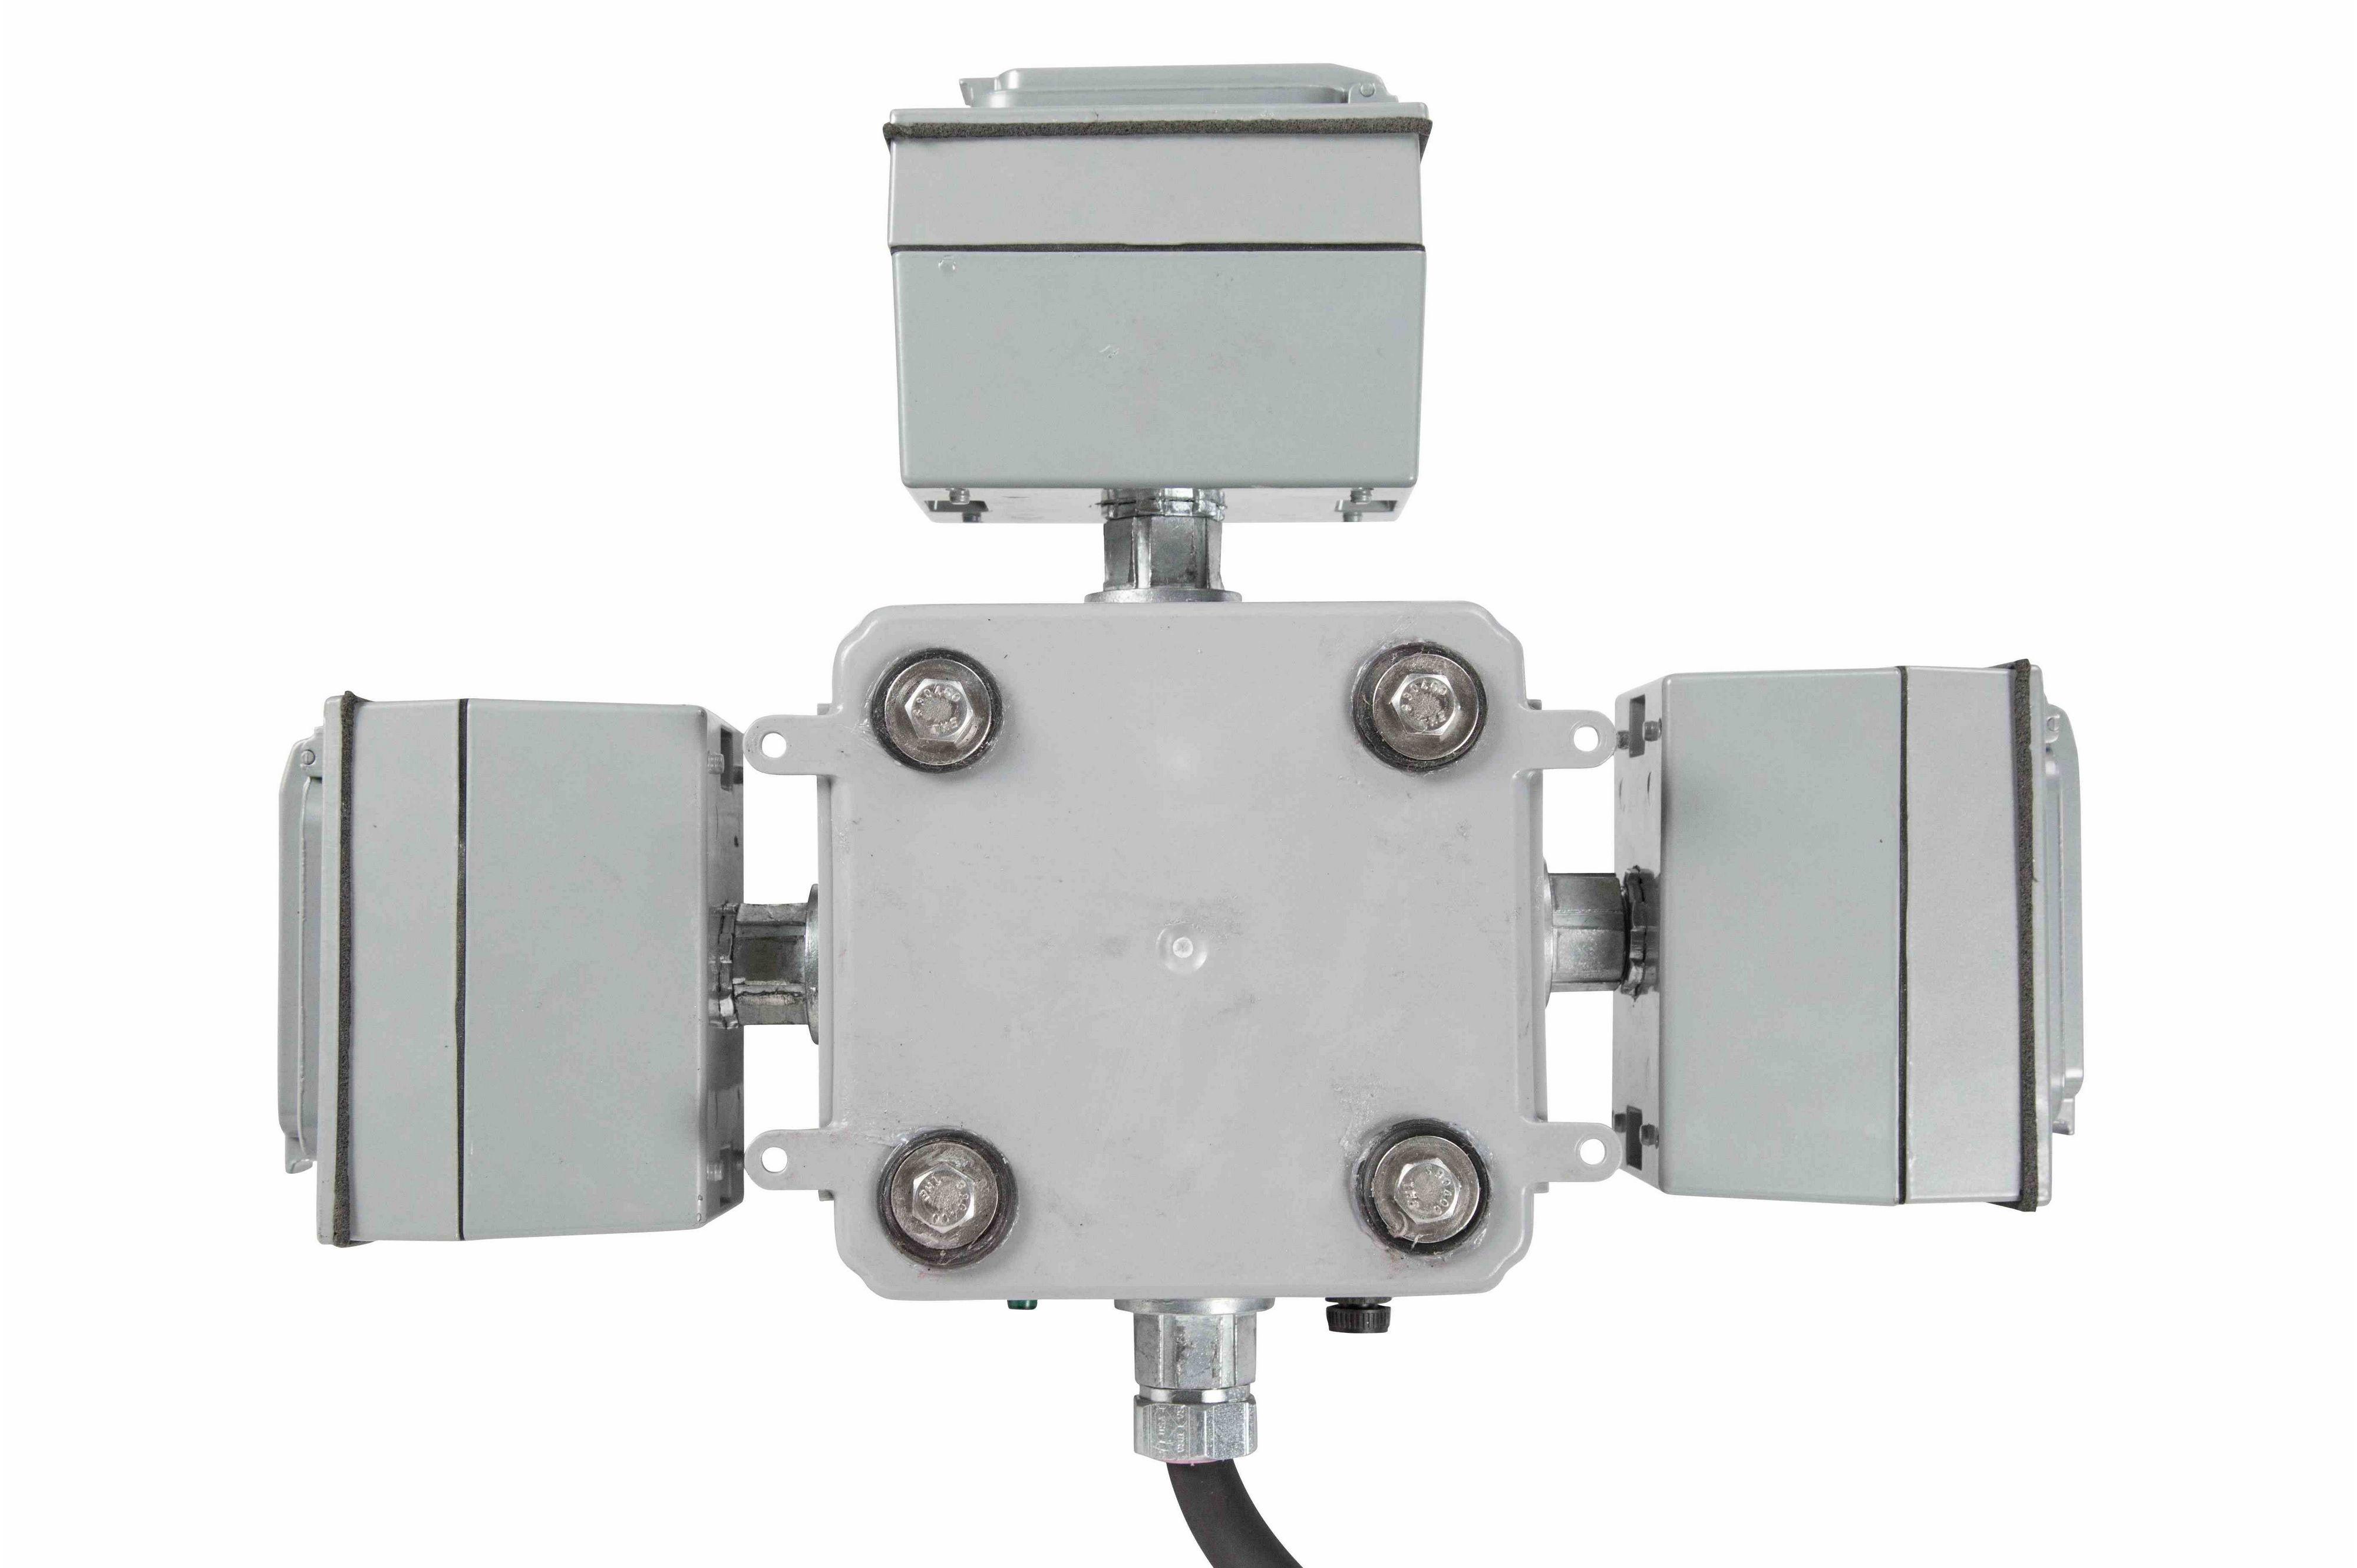 120v receptacle wiring diagram of skeletal ribs rv 30 amp inlet electric